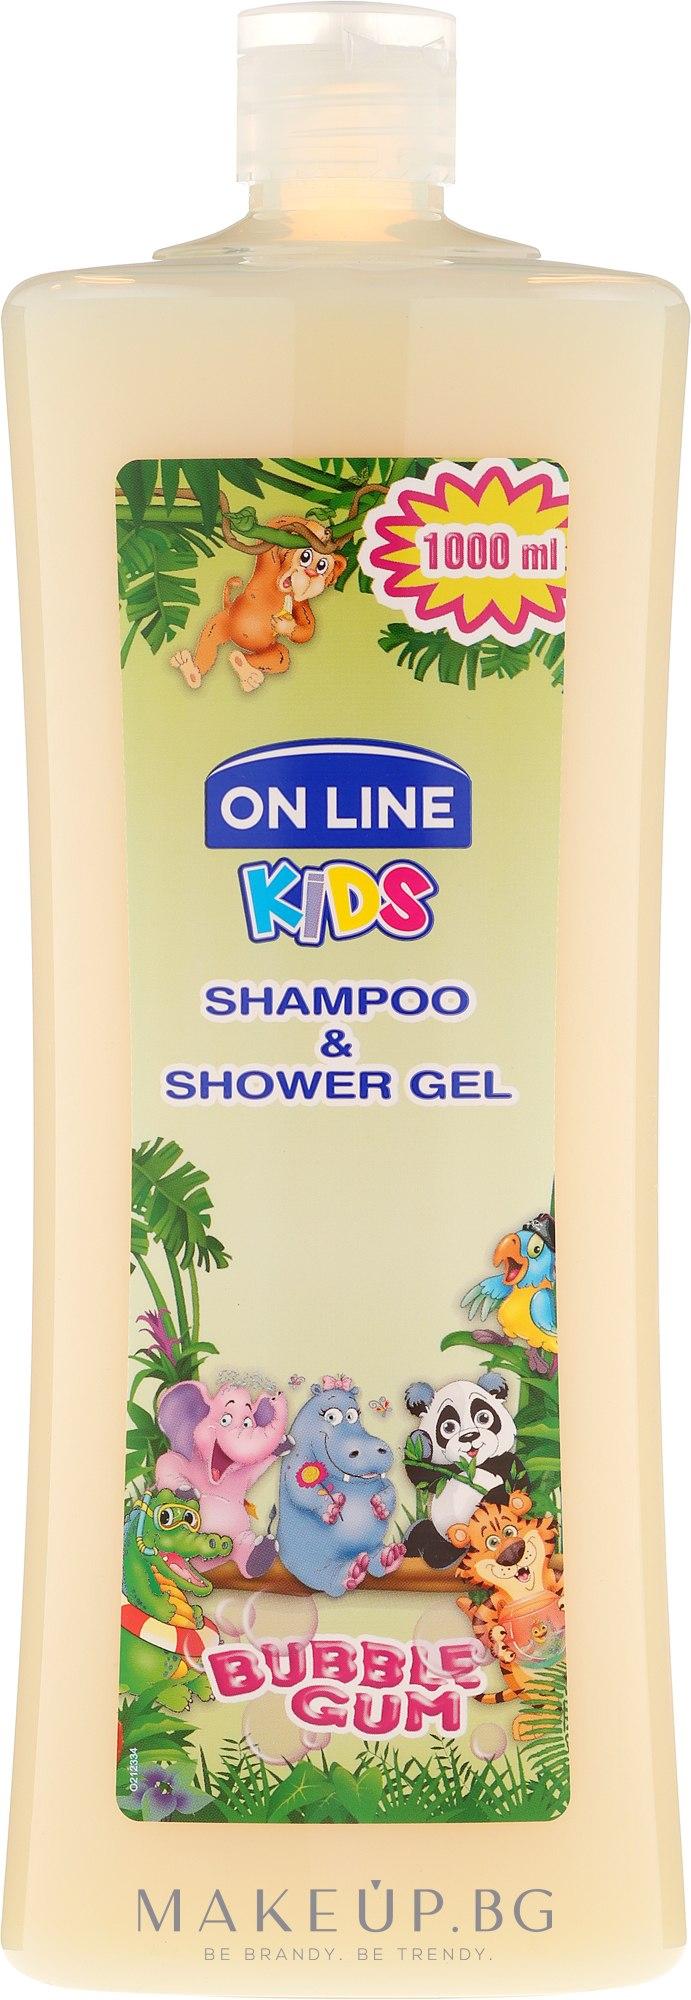 "Шампоан-душ гел за деца ""Дъвка"" - On Line Kids Shampoo & Body Wash Bubble Gum — снимка 1000 ml"